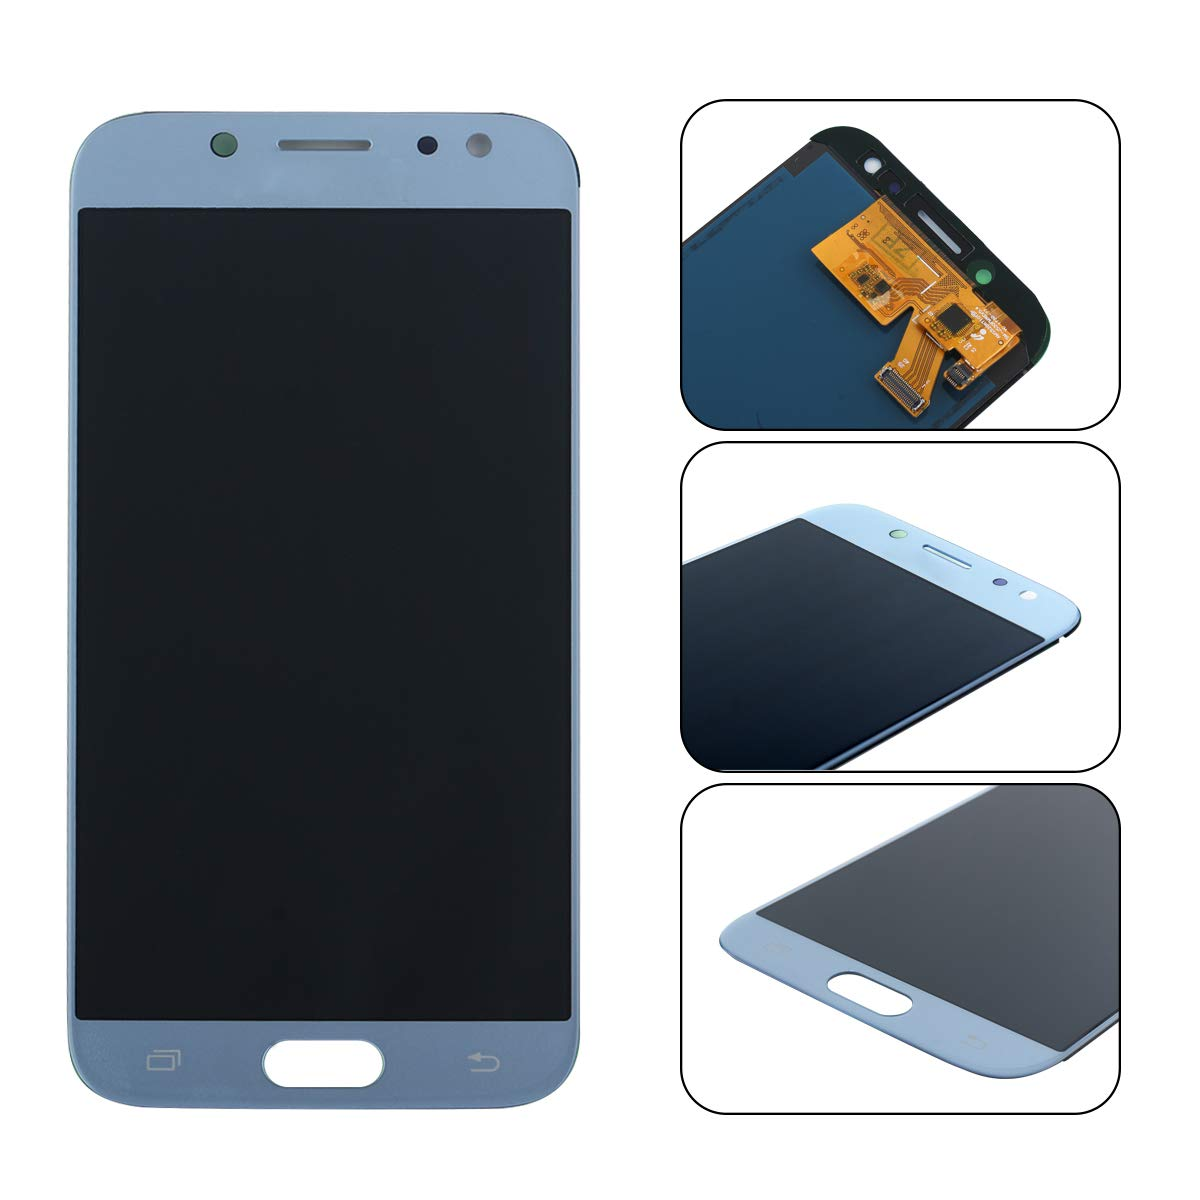 Nero Utensili YHX-OU per Samsung Galaxy J5 2017 J530 SM-J530F di Riparazione e Sostituzione LCD Display Touch Screen Digitizer